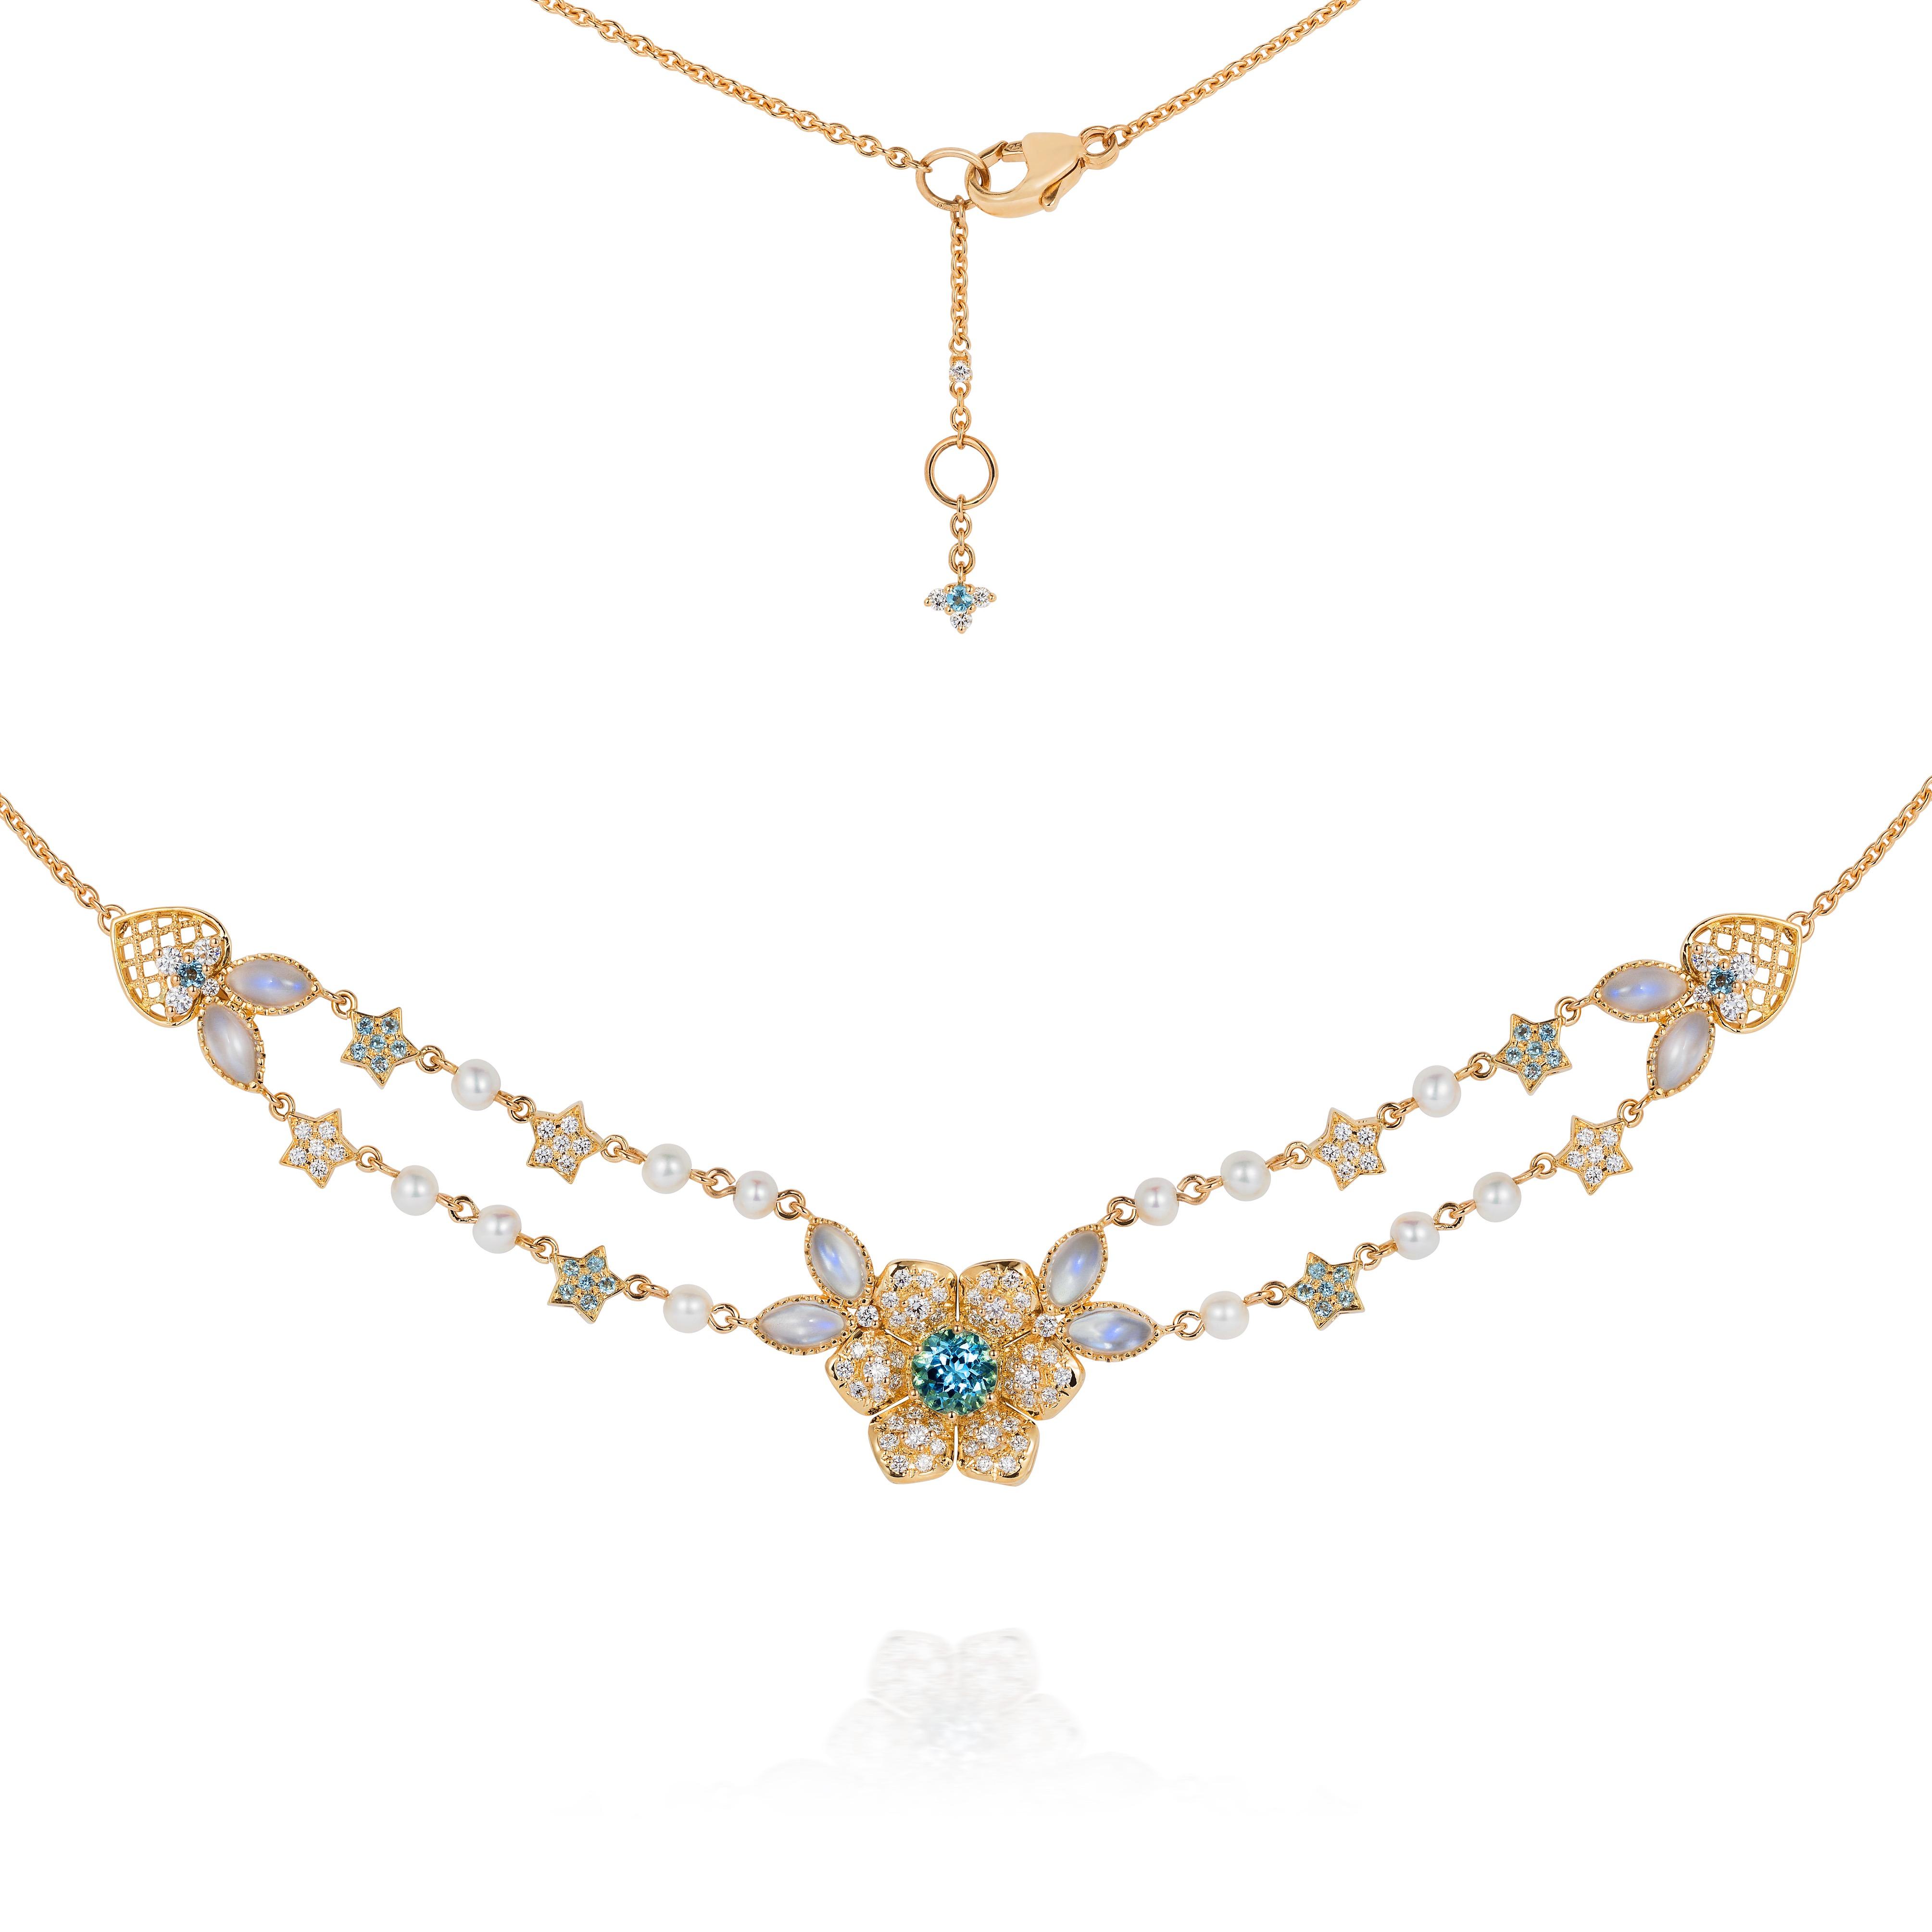 Aquamarine, Diamond, Moonstone And Baby Pearl Necklace 18k Gold